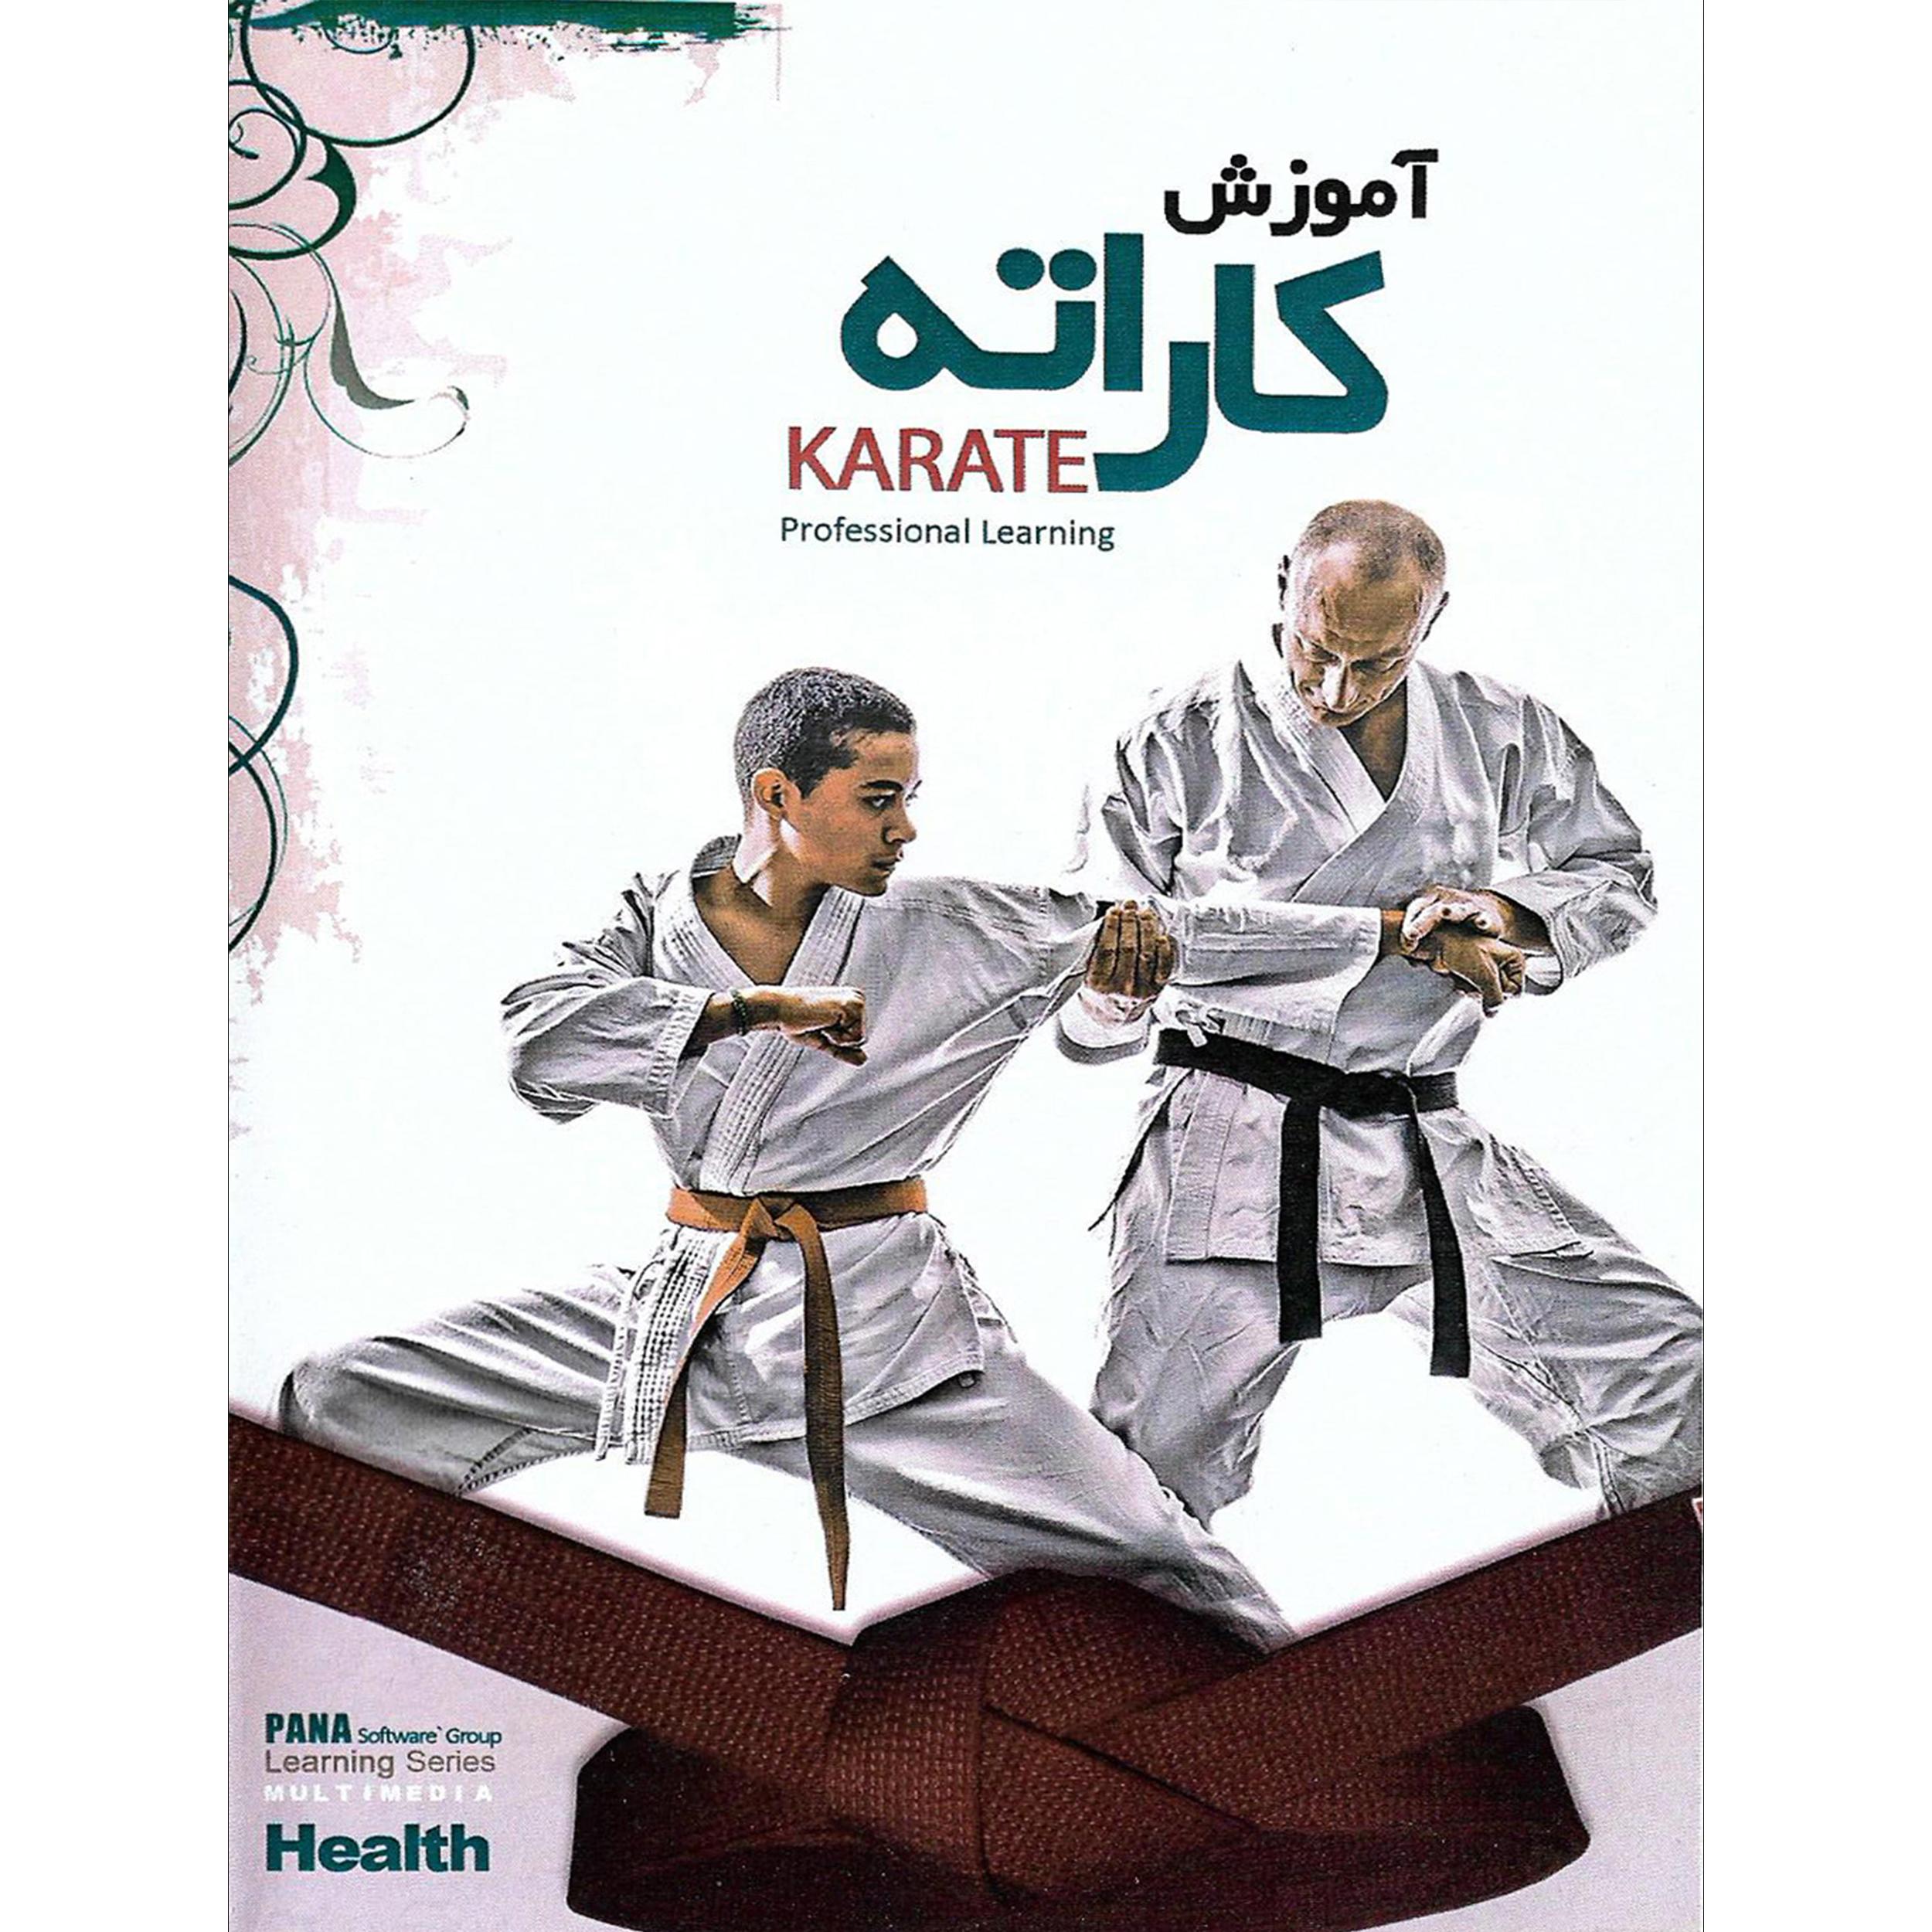 عکس نرم افزار آموزش کاراته نشر پاناپرداز